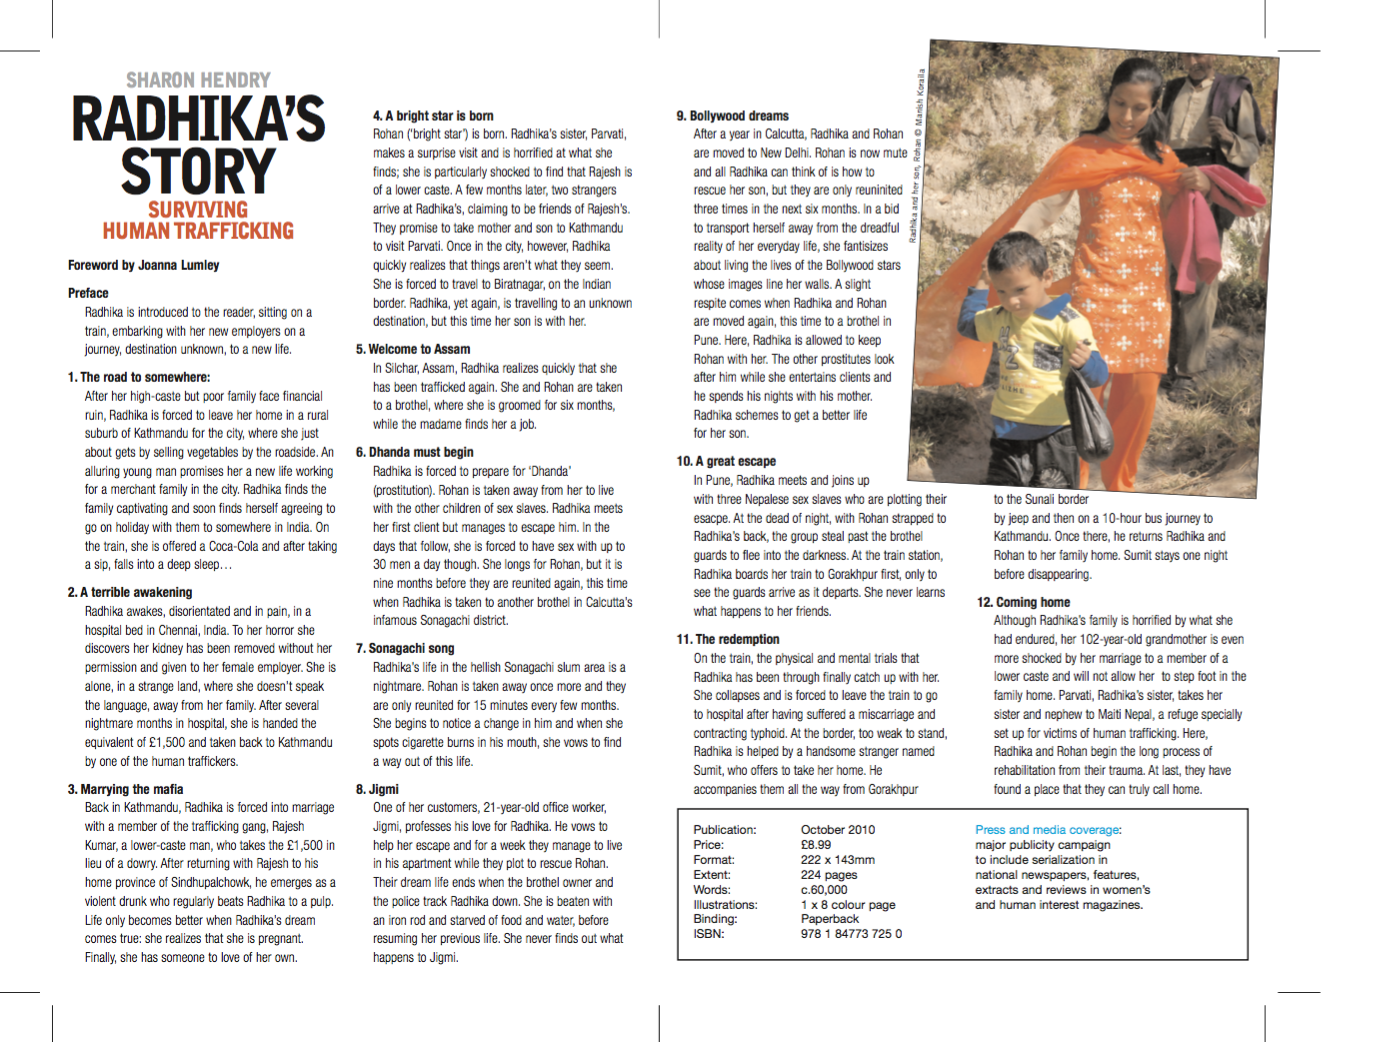 Radhika's Story - Publisher Information